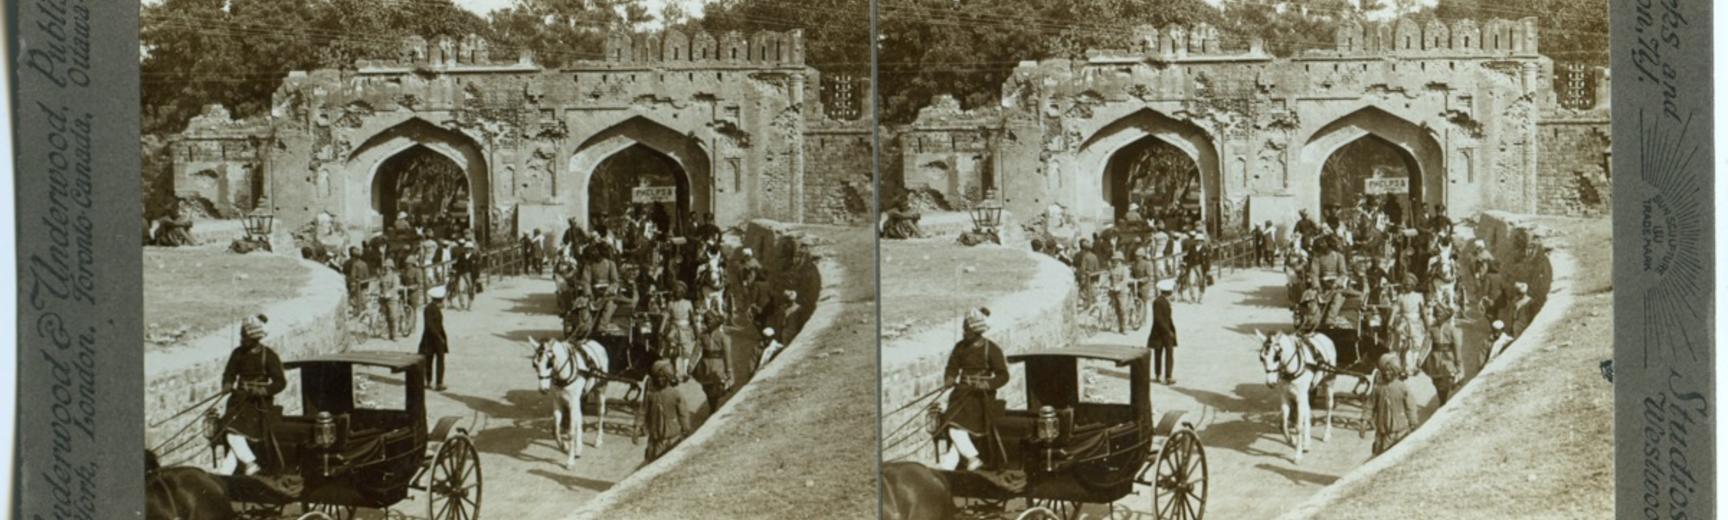 Image of Delhi Gate